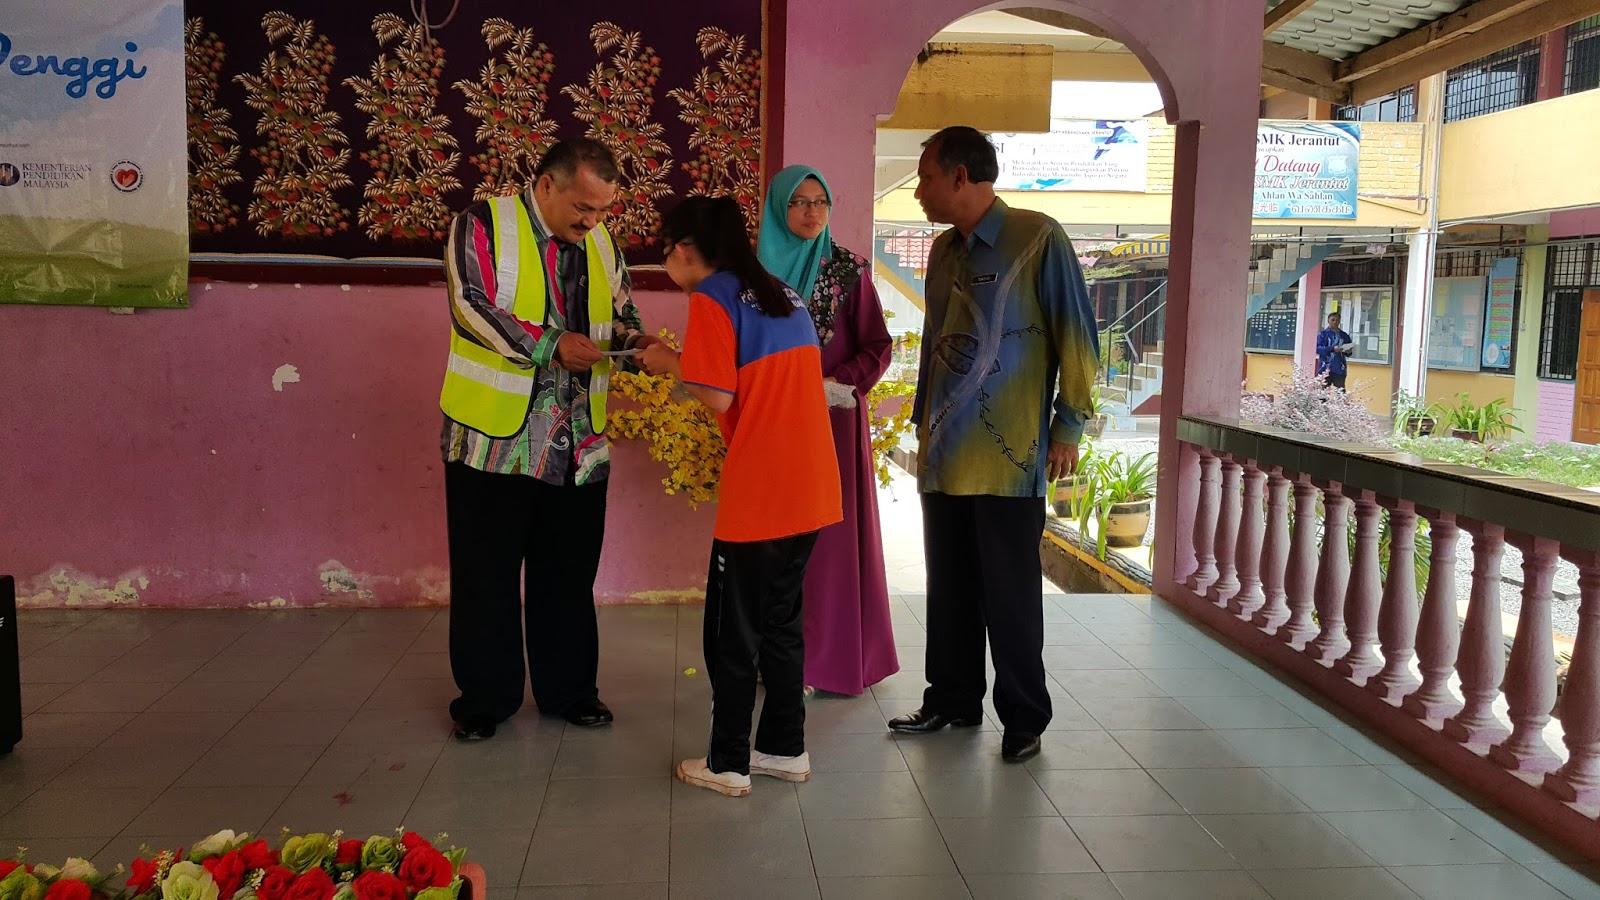 smk jerantut dengue buster dengue buster alley opening ceremony 20151022 131852 jpg